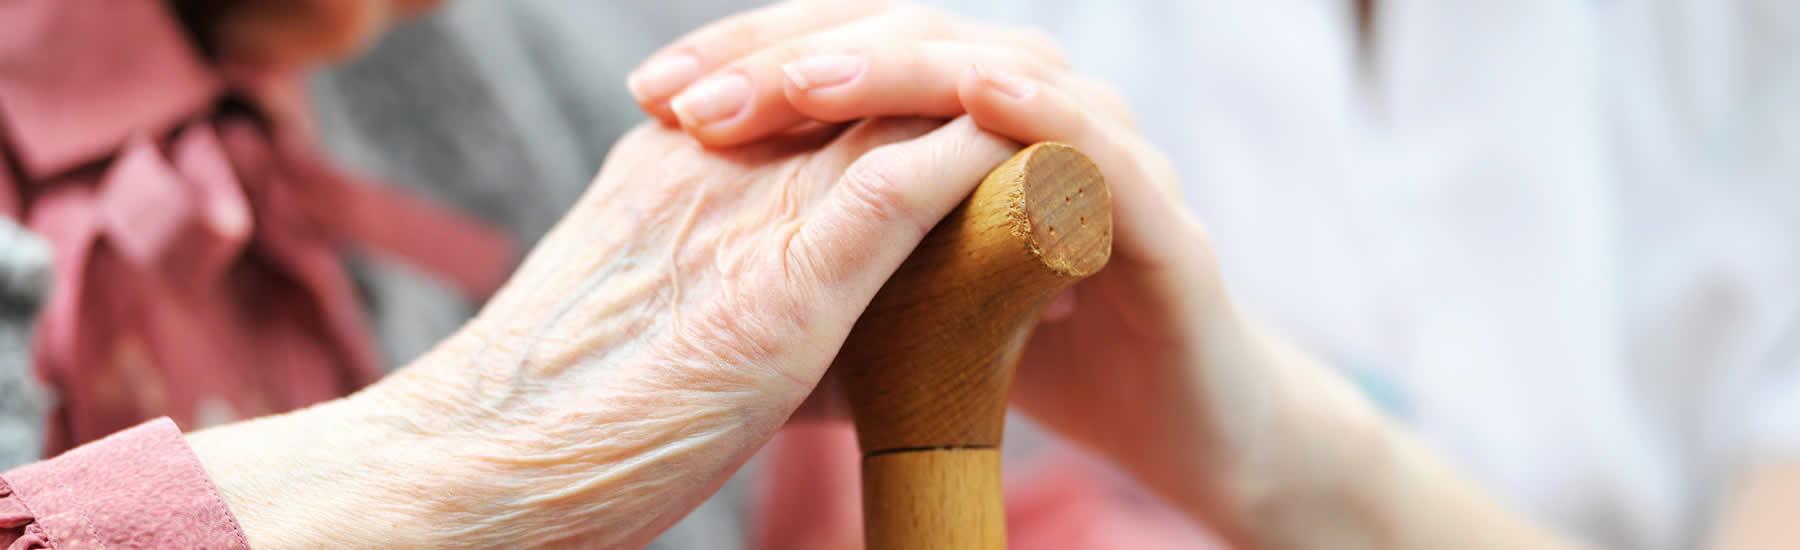 LB Homes offers Christ-centered senior living and care in Fergus Falls, Minnesota.